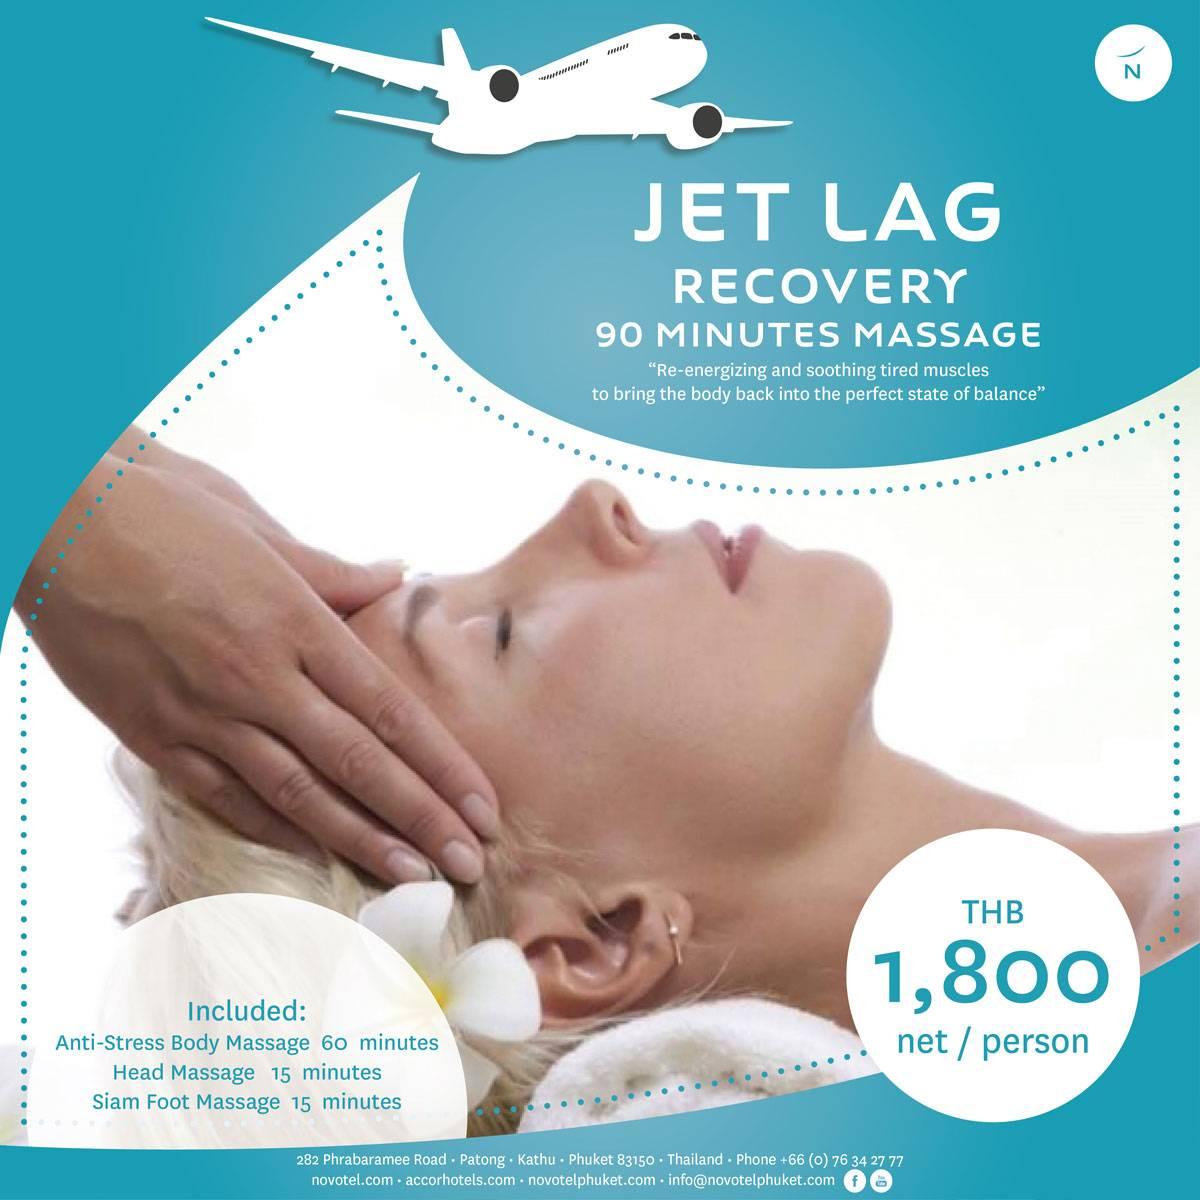 Jet Lag Recovery Massage